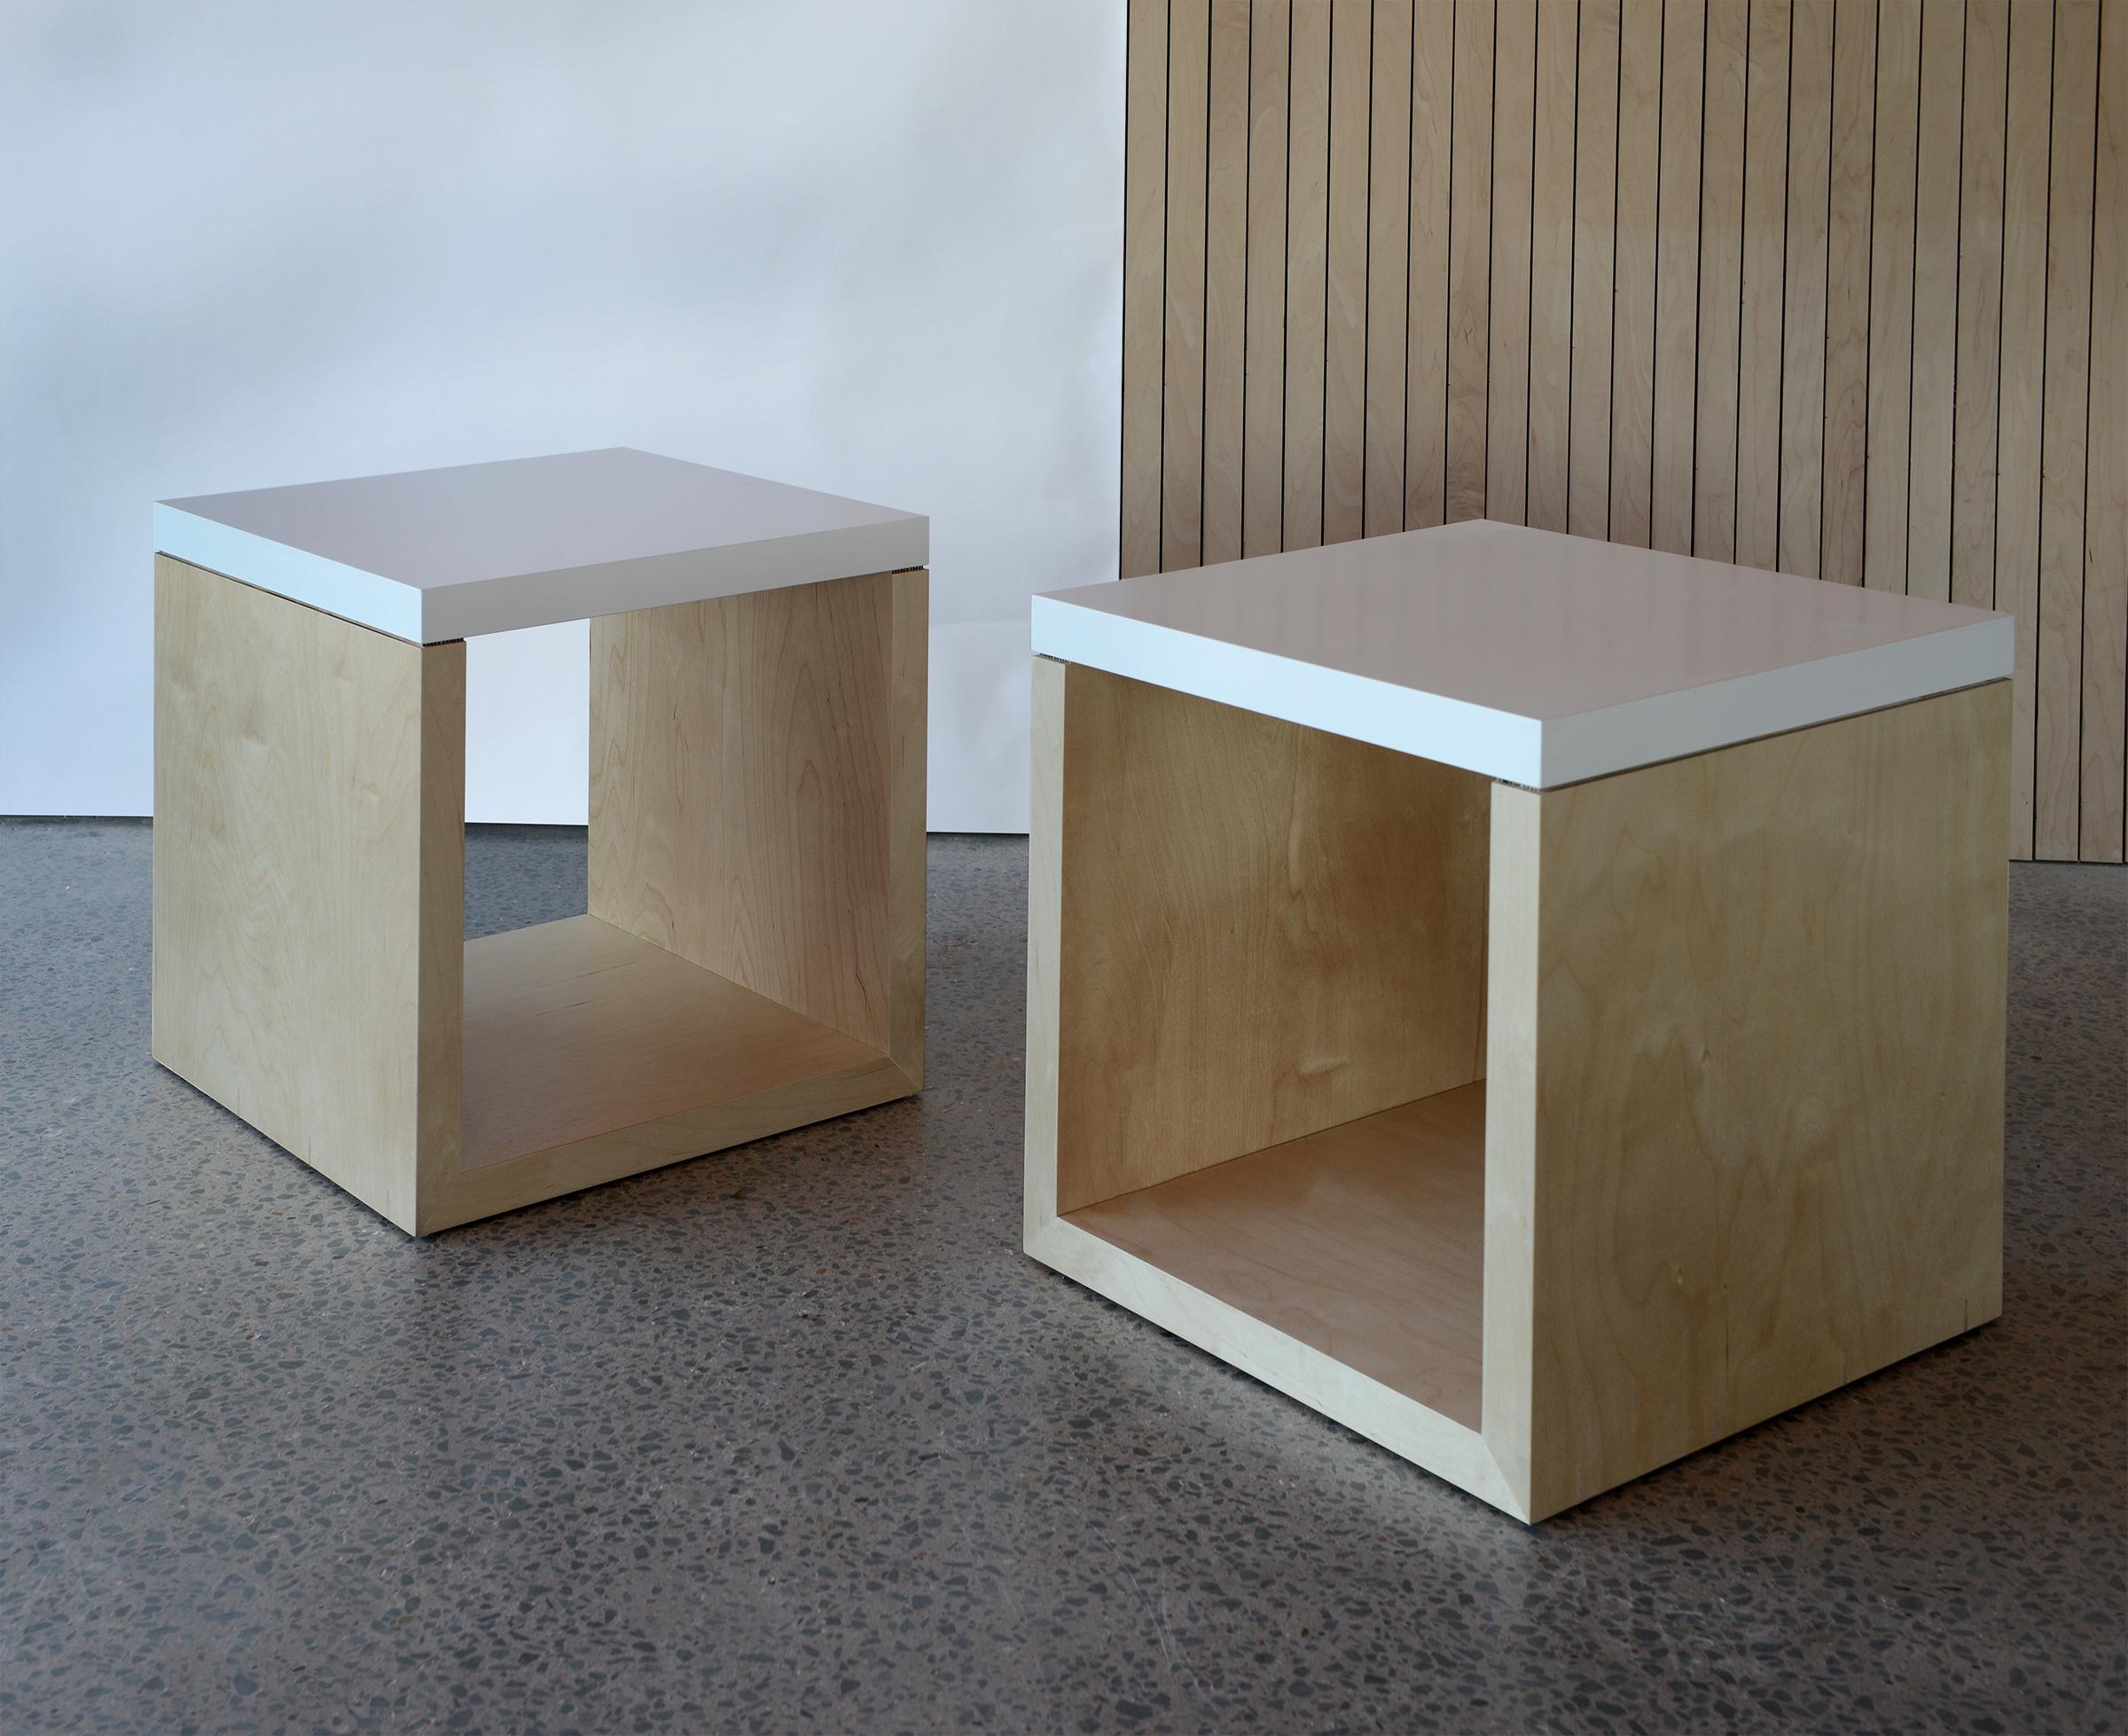 cubes_2_small.jpg